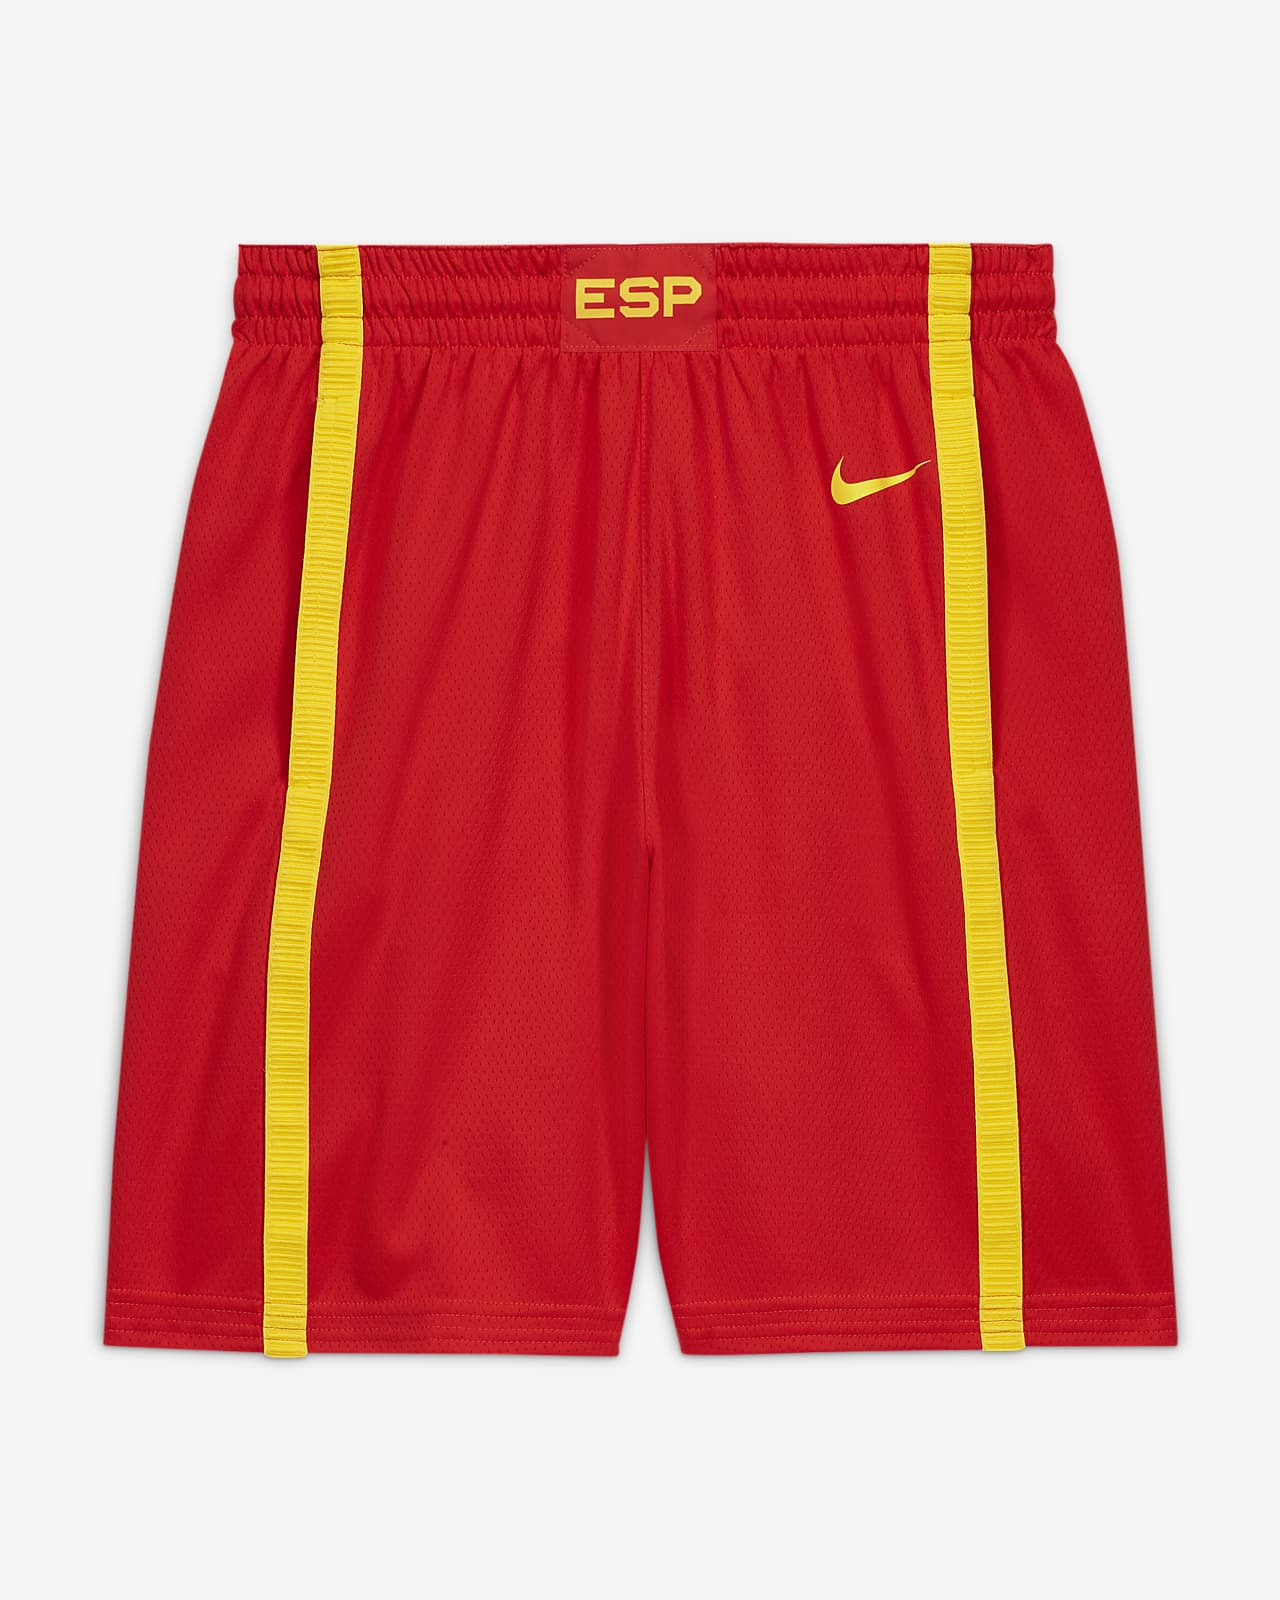 Spain Nike (Road) Limited Men's Basketball Shorts